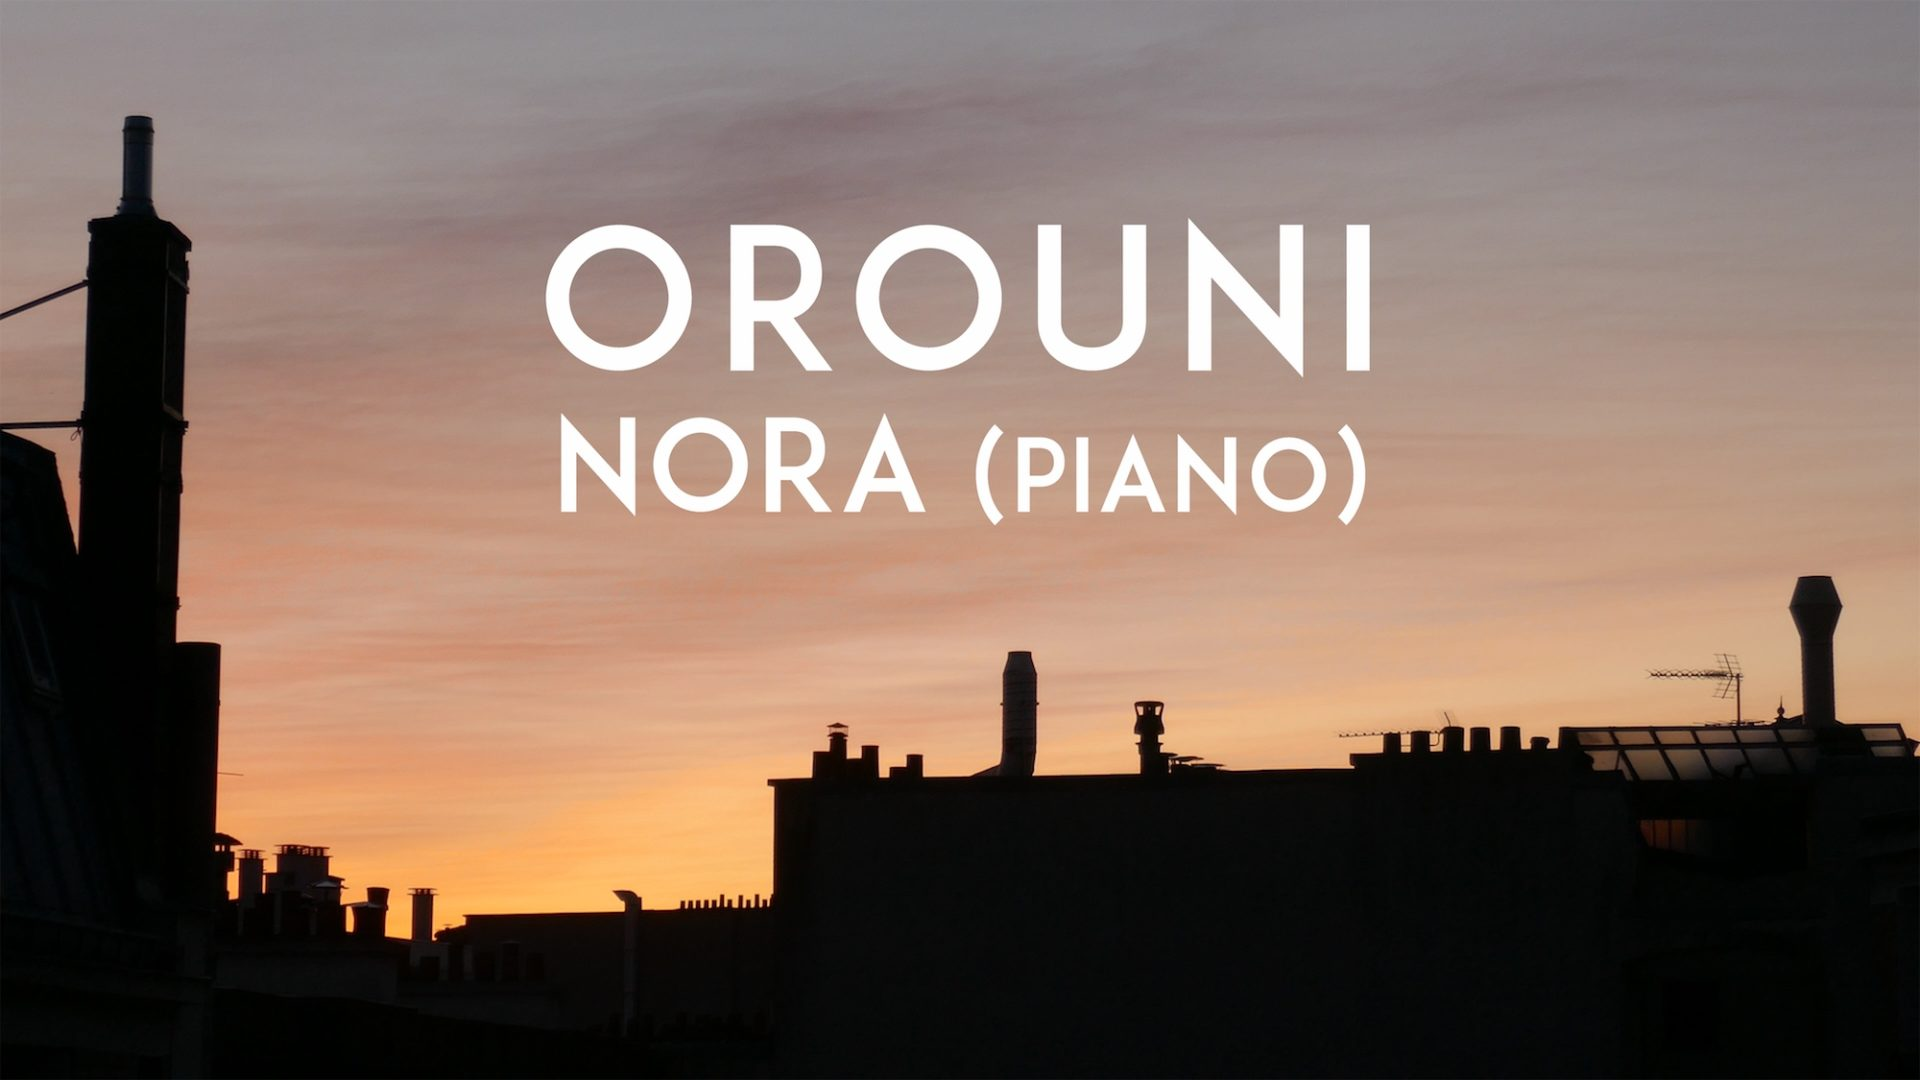 Magic_Orouni_Nora